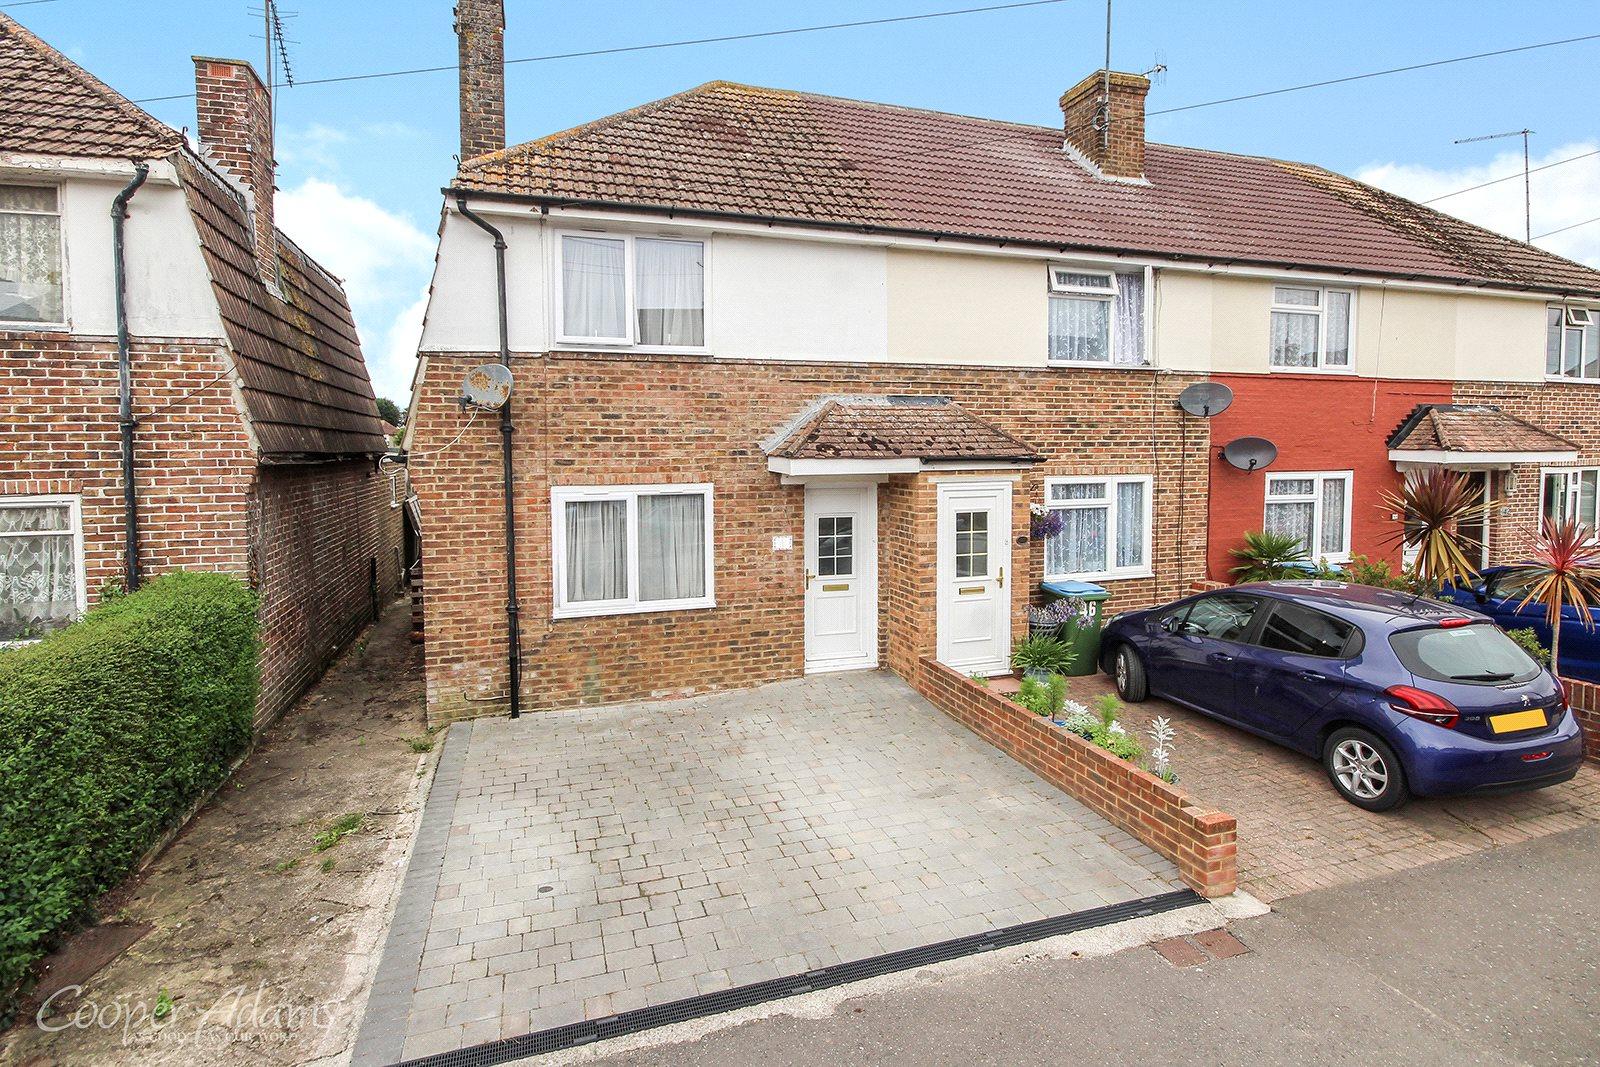 2 bed house for sale in Conbar Avenue, Rustington, BN16